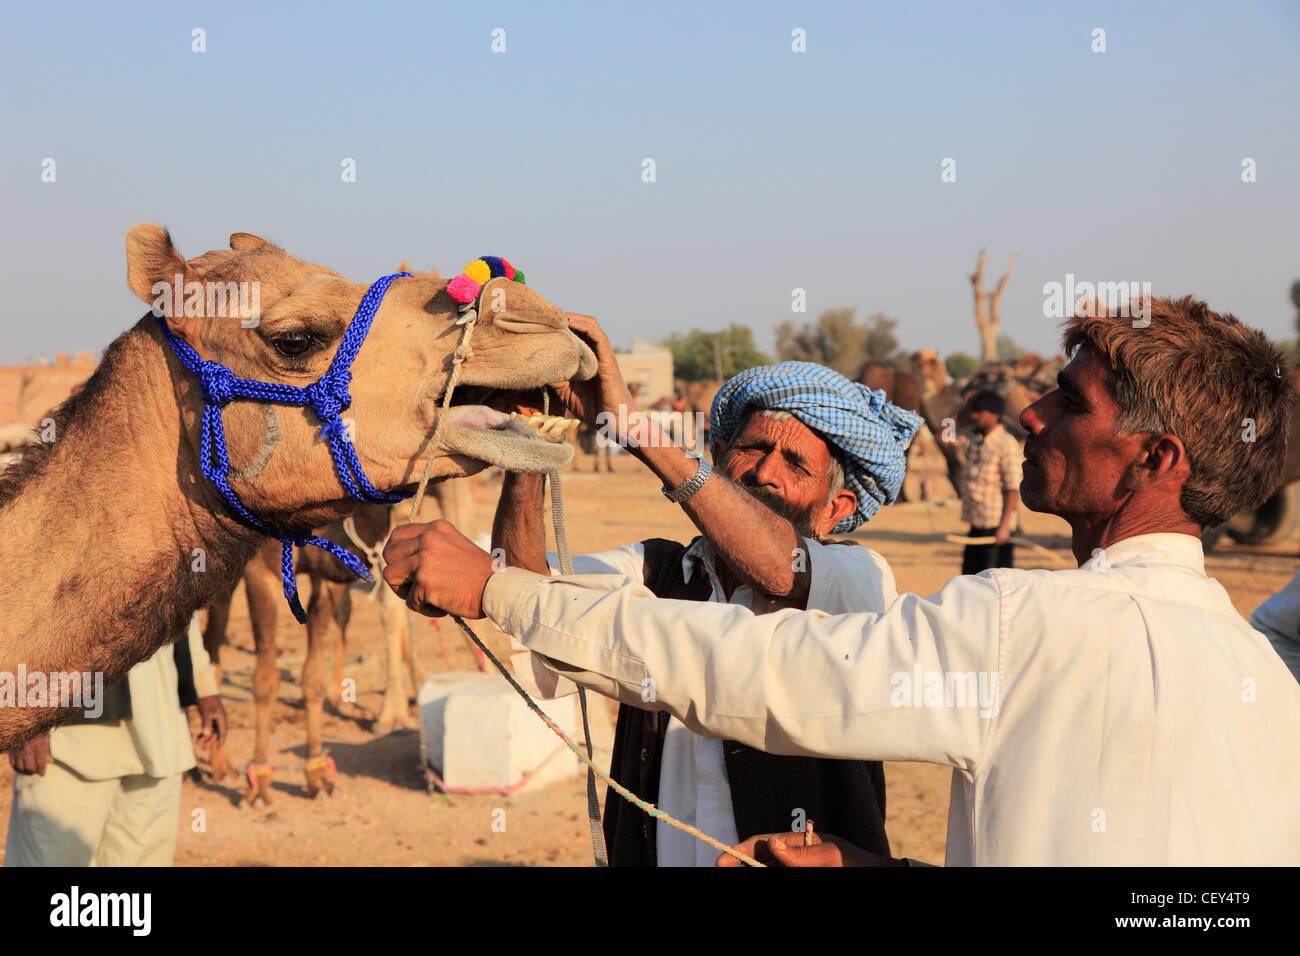 India, Rajasthan, Nagaur, Fair, camel, people, buyer looking at the teeth, - Stock Image